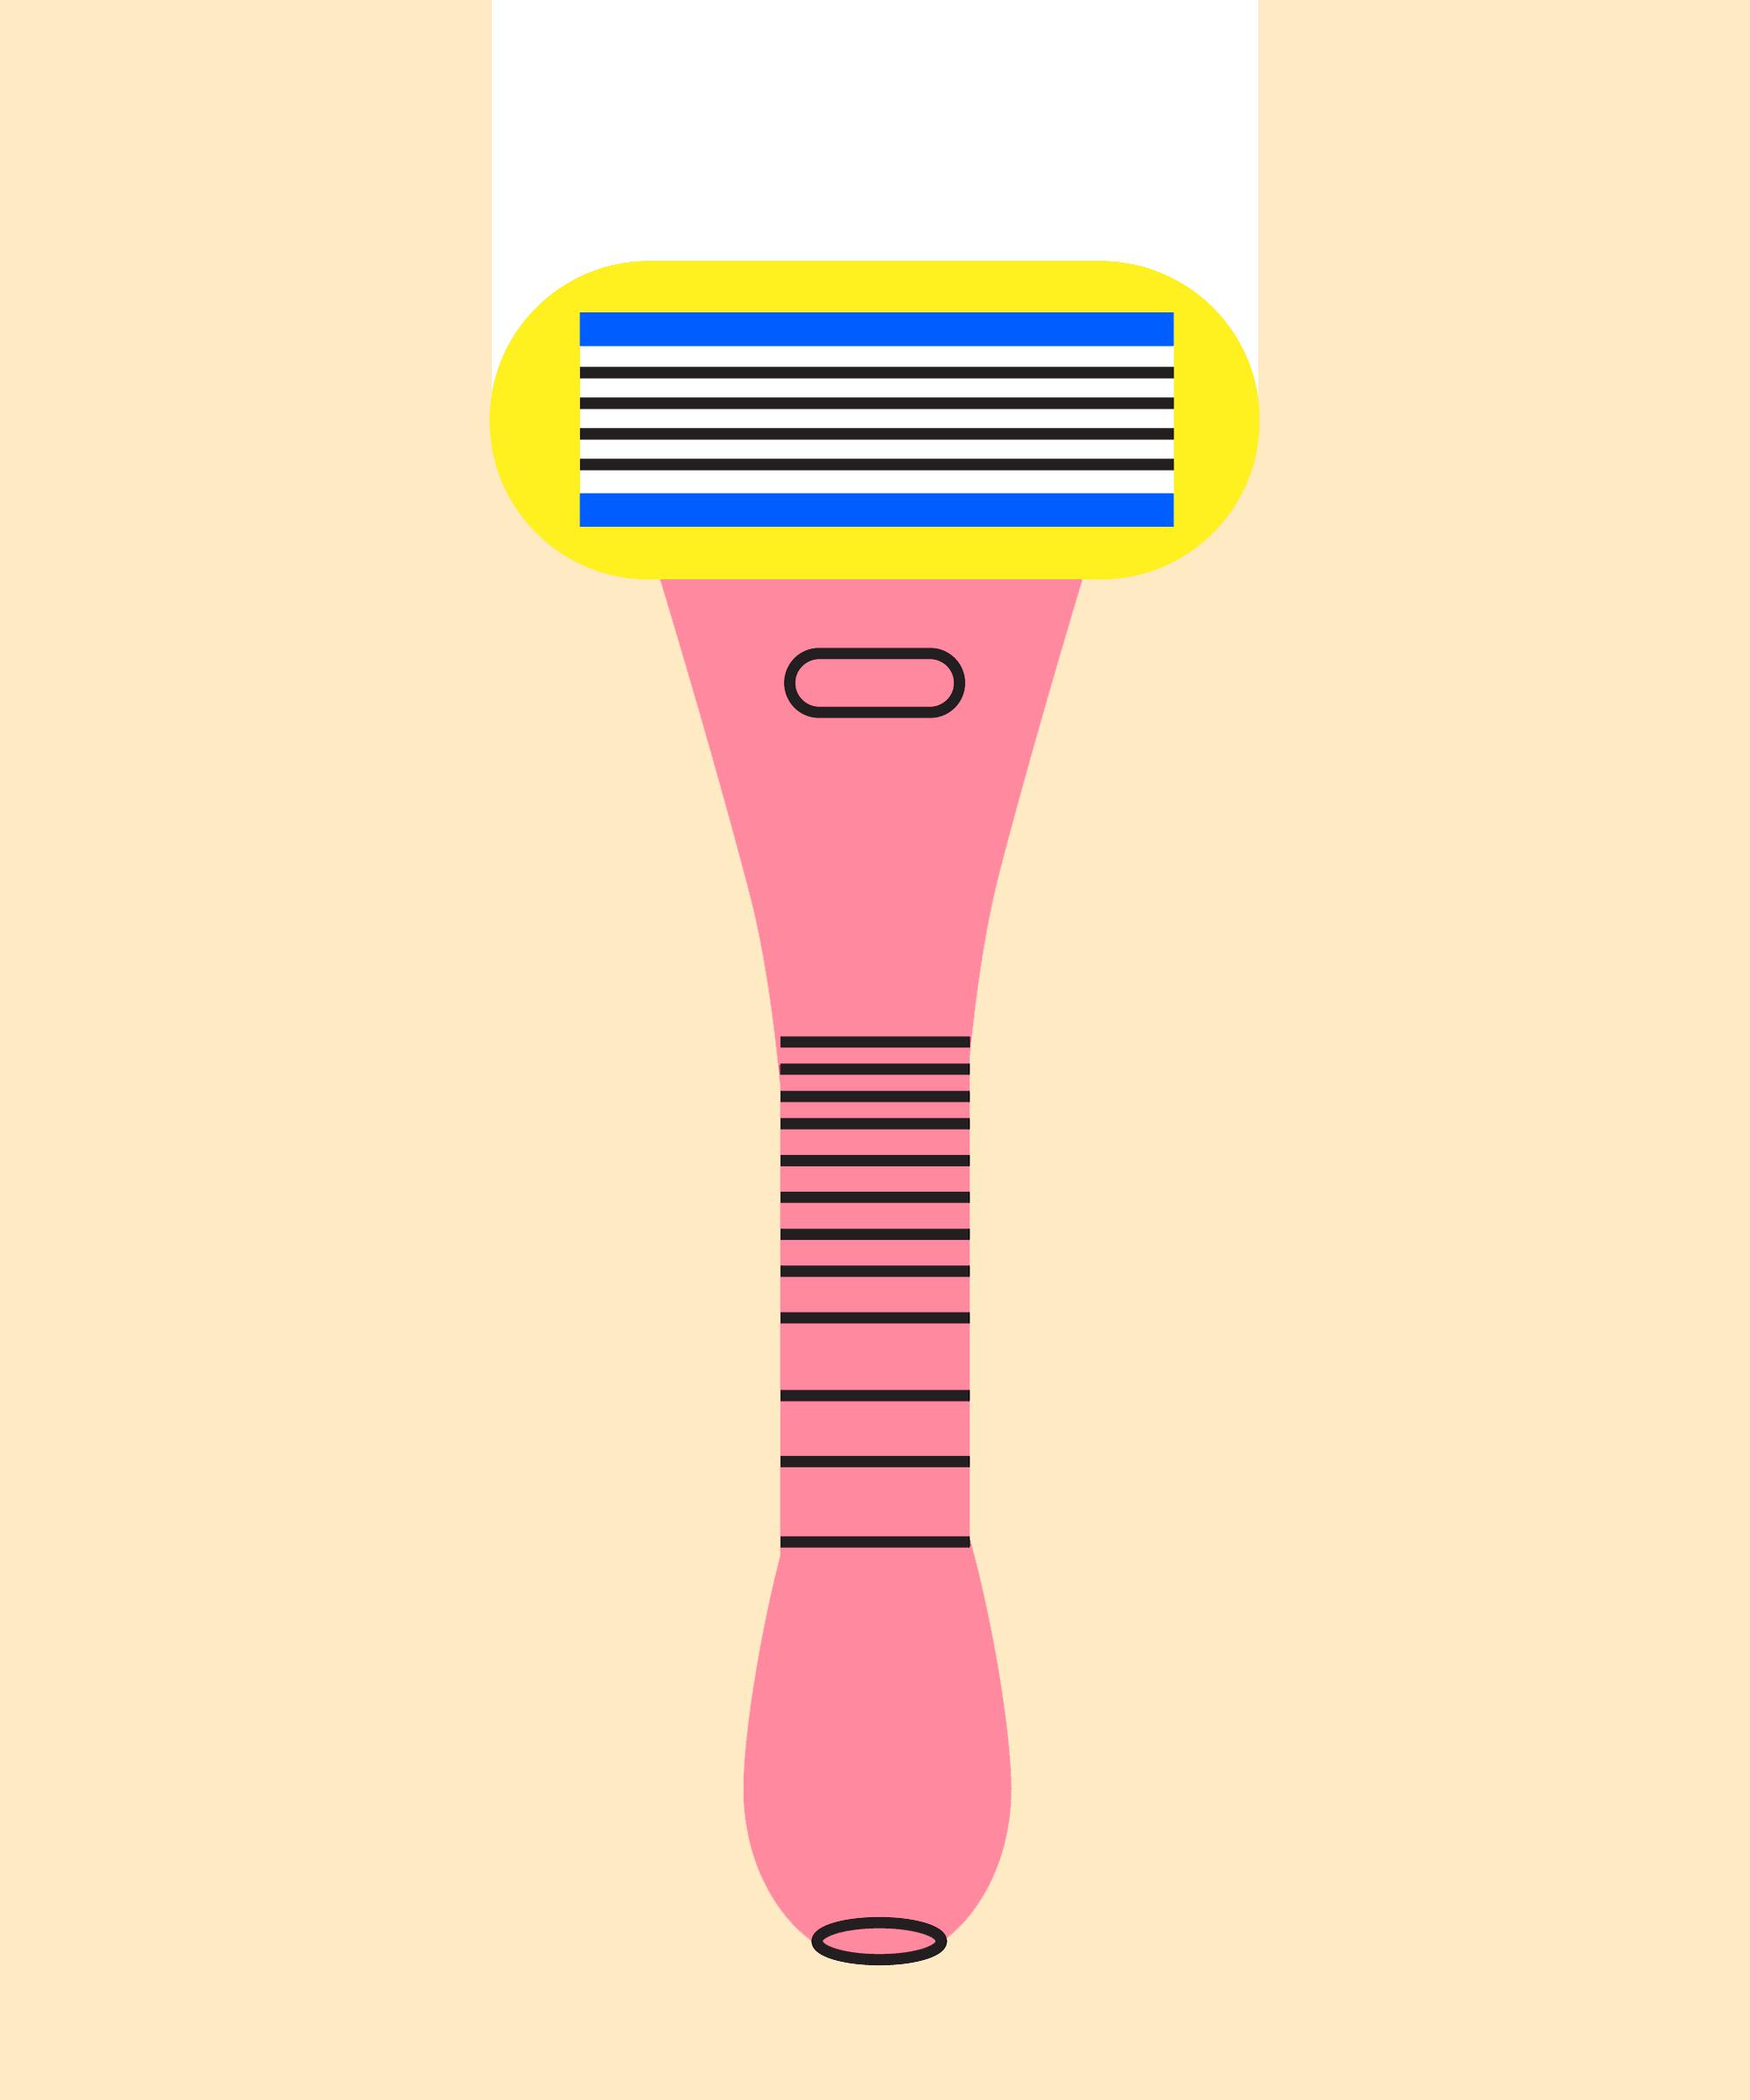 How To Treat Ingrown Hairs